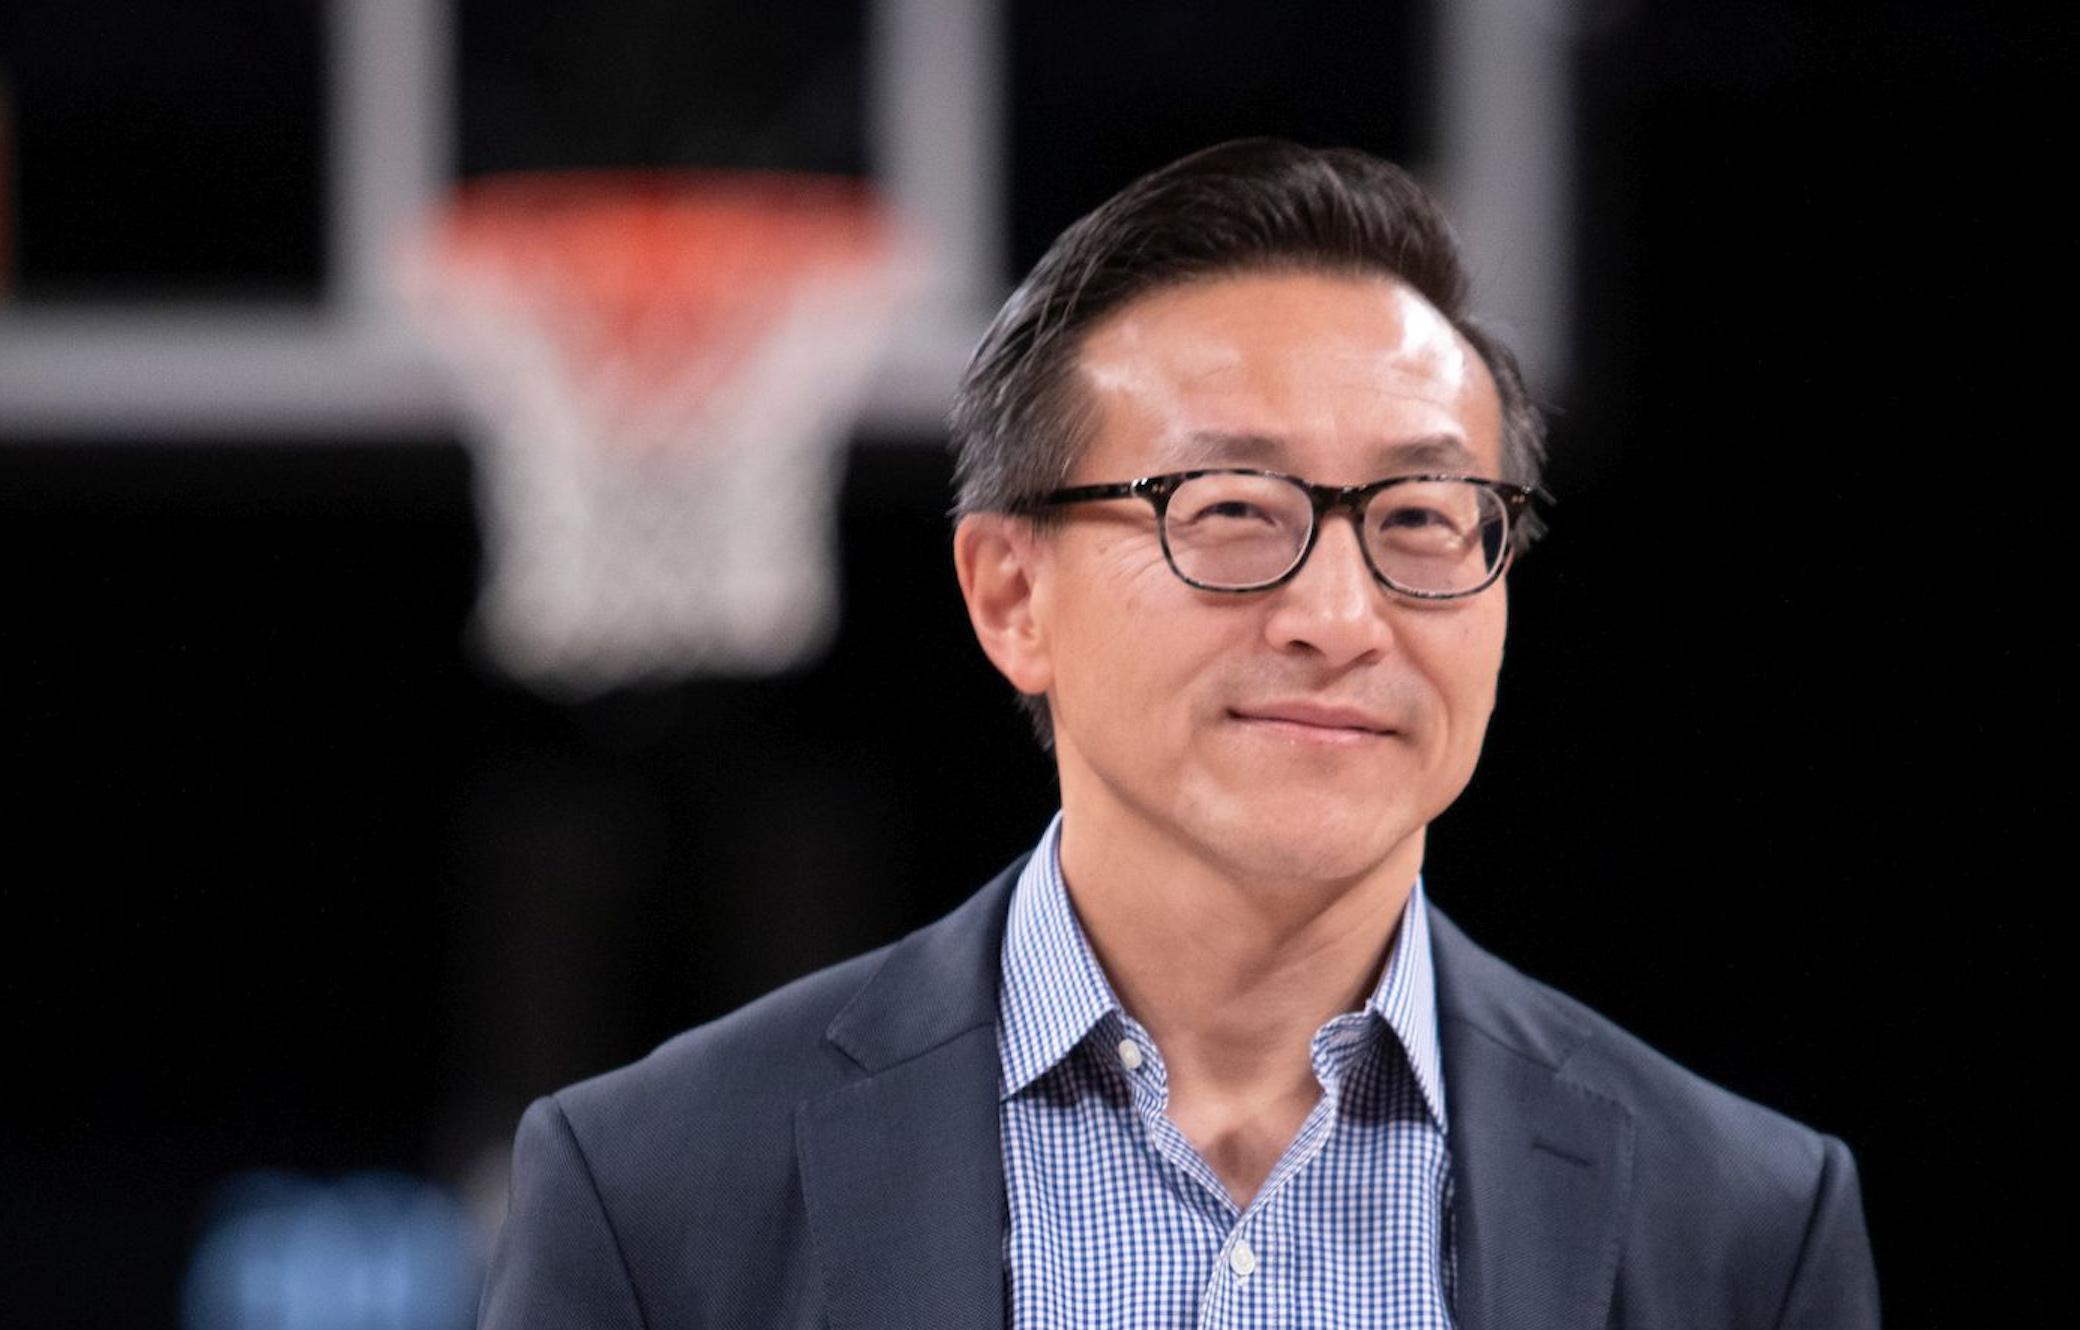 Joe Tsai at the Barclays Center